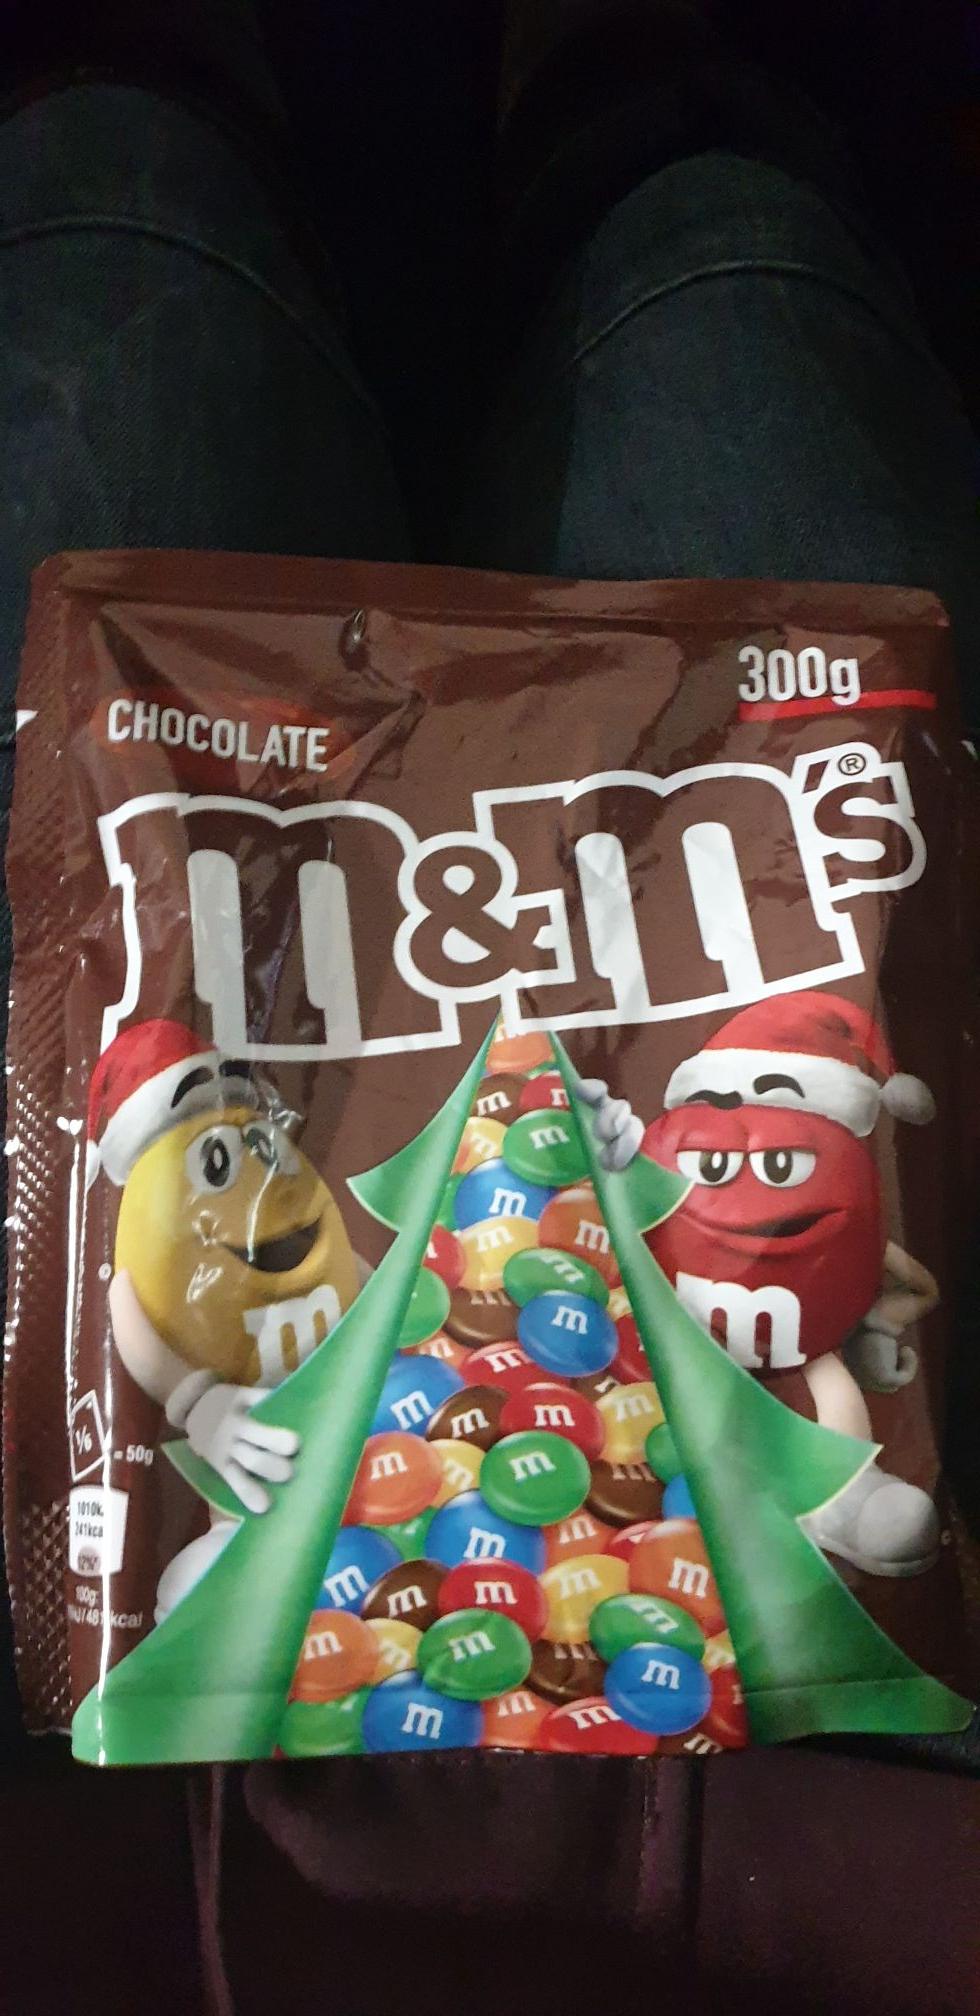 2 zakken M&m kerst 75% korting jumbo papendrecht